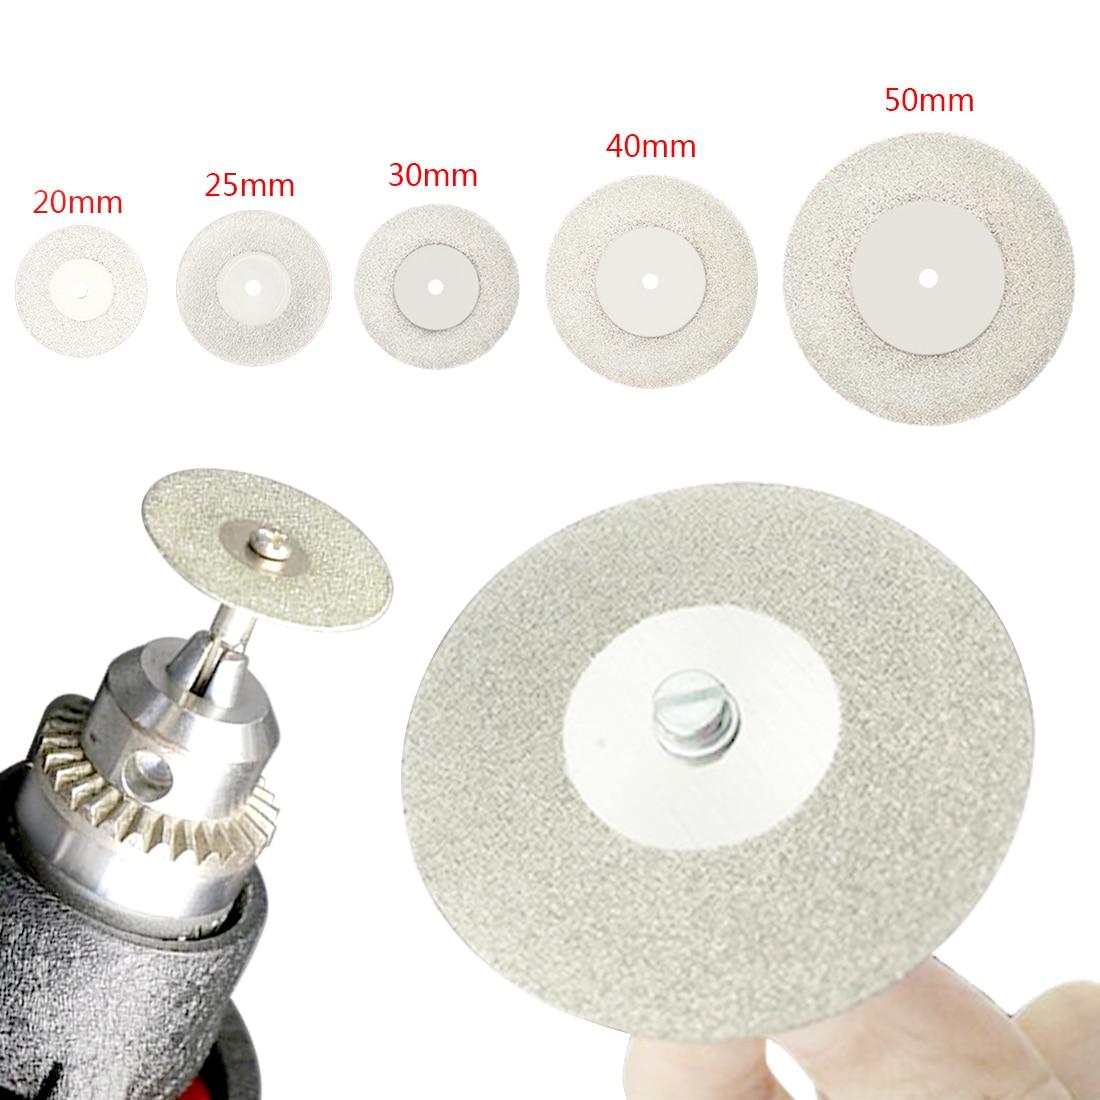 Mini Cutting Disc For Rotory Accessories Diamond Grinding Wheel Rotary Circular Saw Blade Abrasive Diamond Disc For Dremel Tool